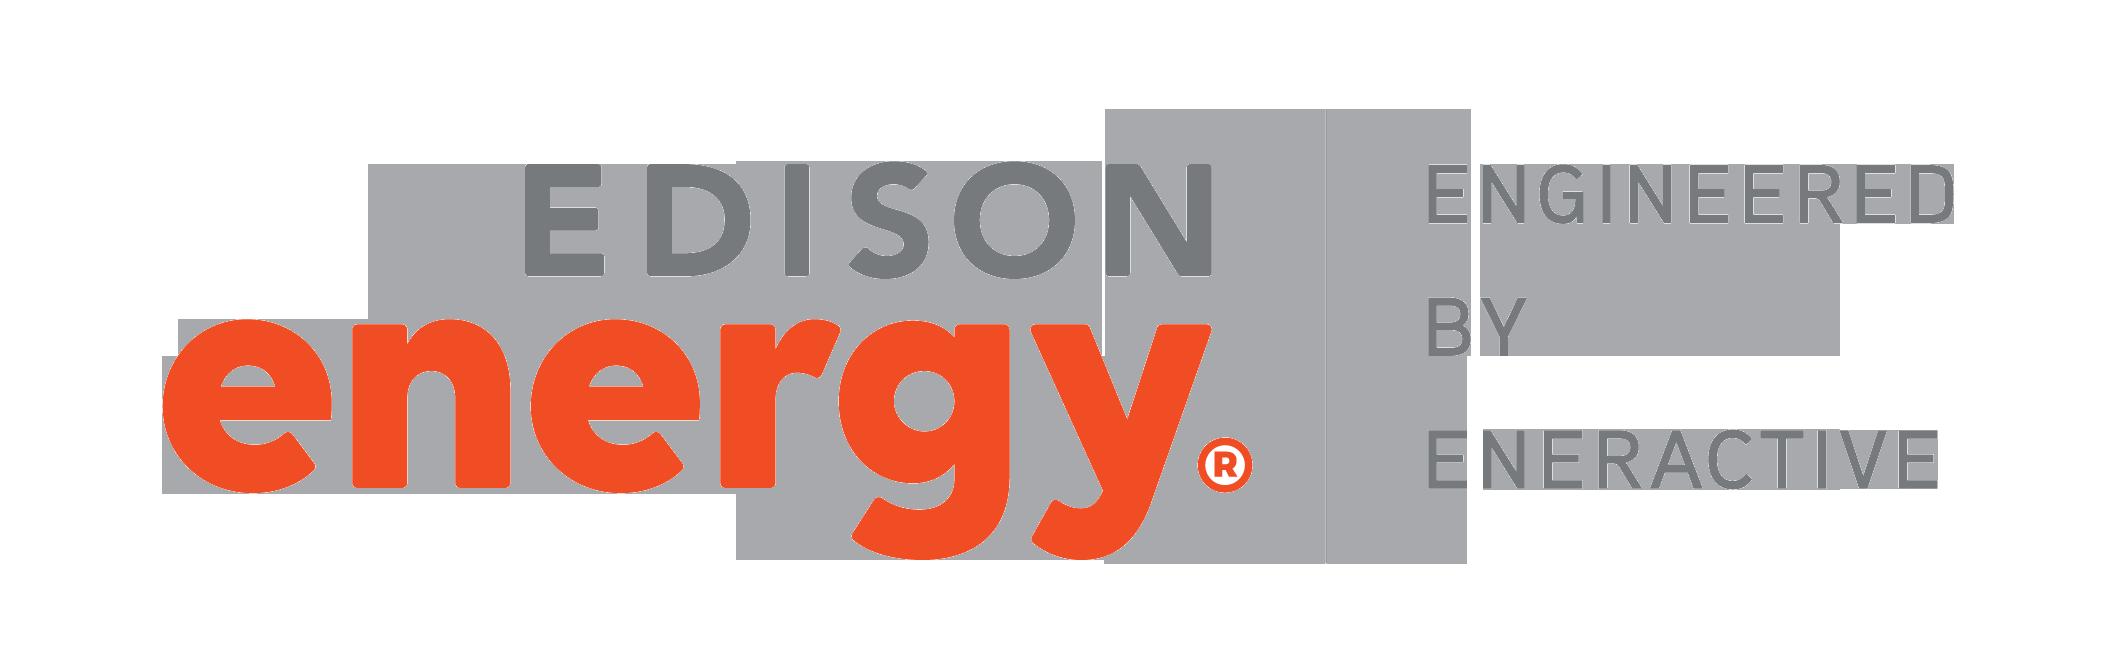 Edison-Energy